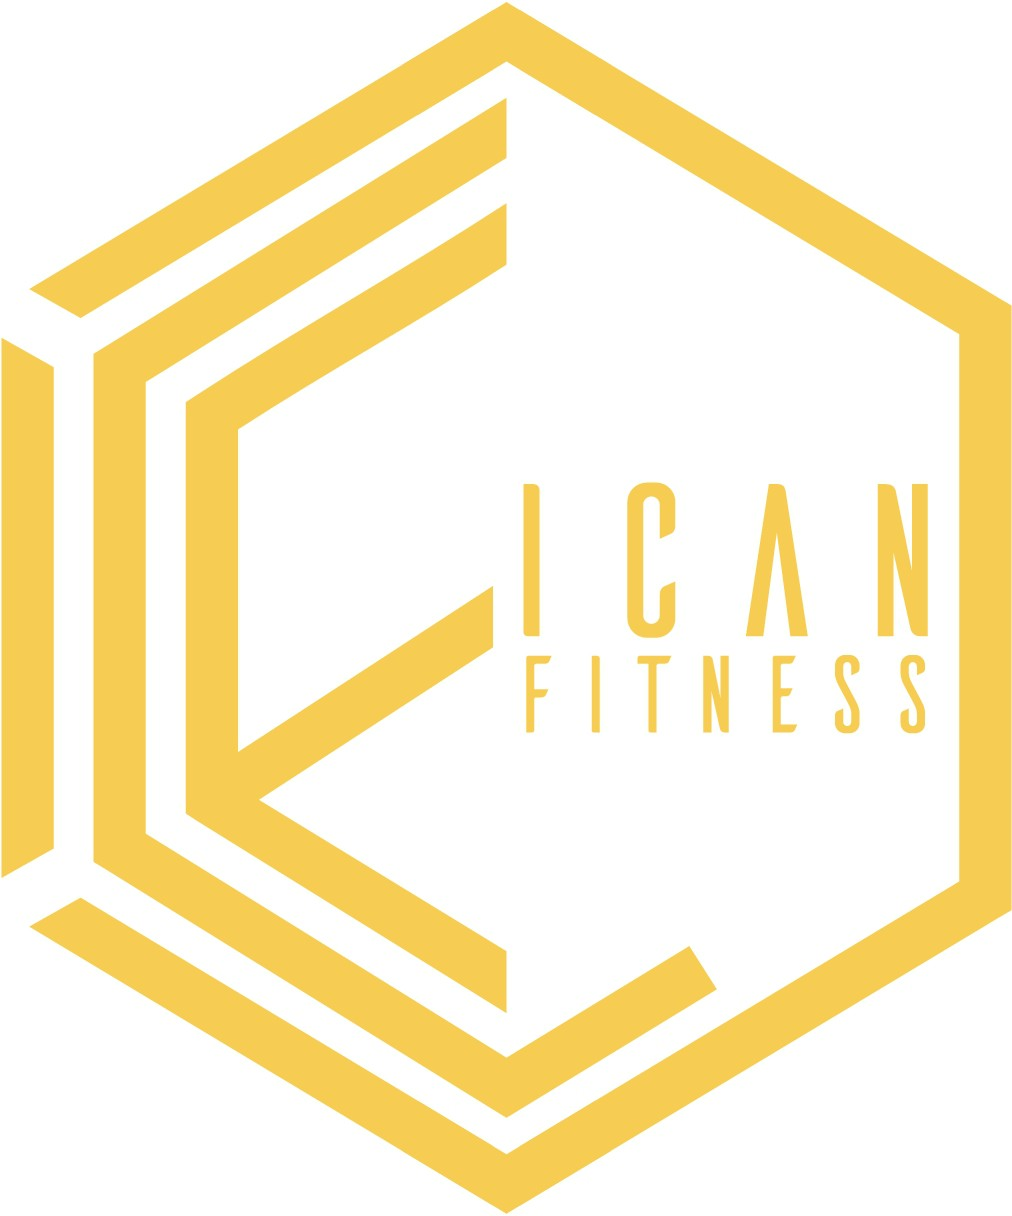 The Next Fitness Revolution